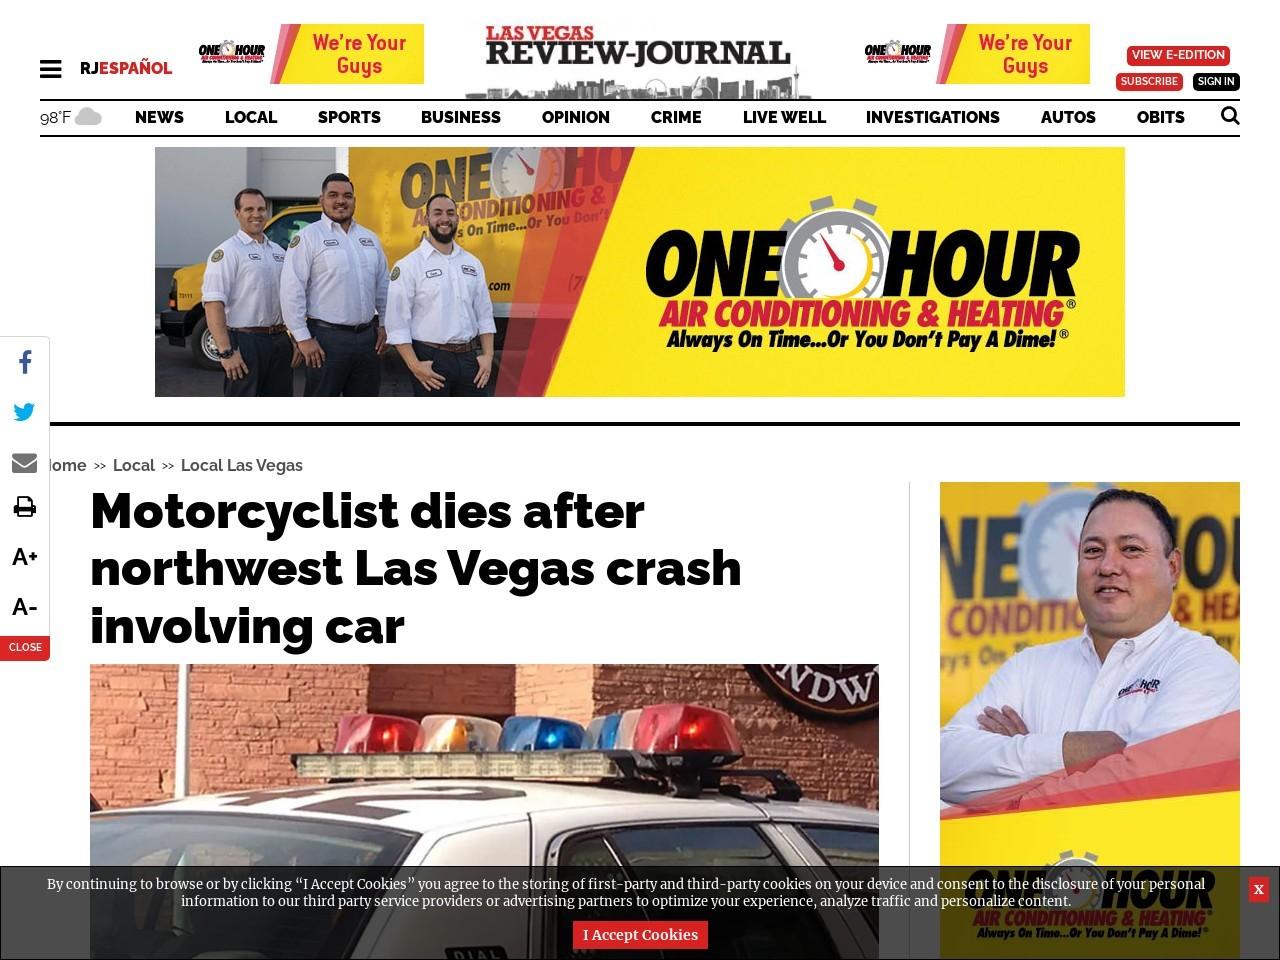 Motorcyclist dies after northwest Las Vegas crash involving car